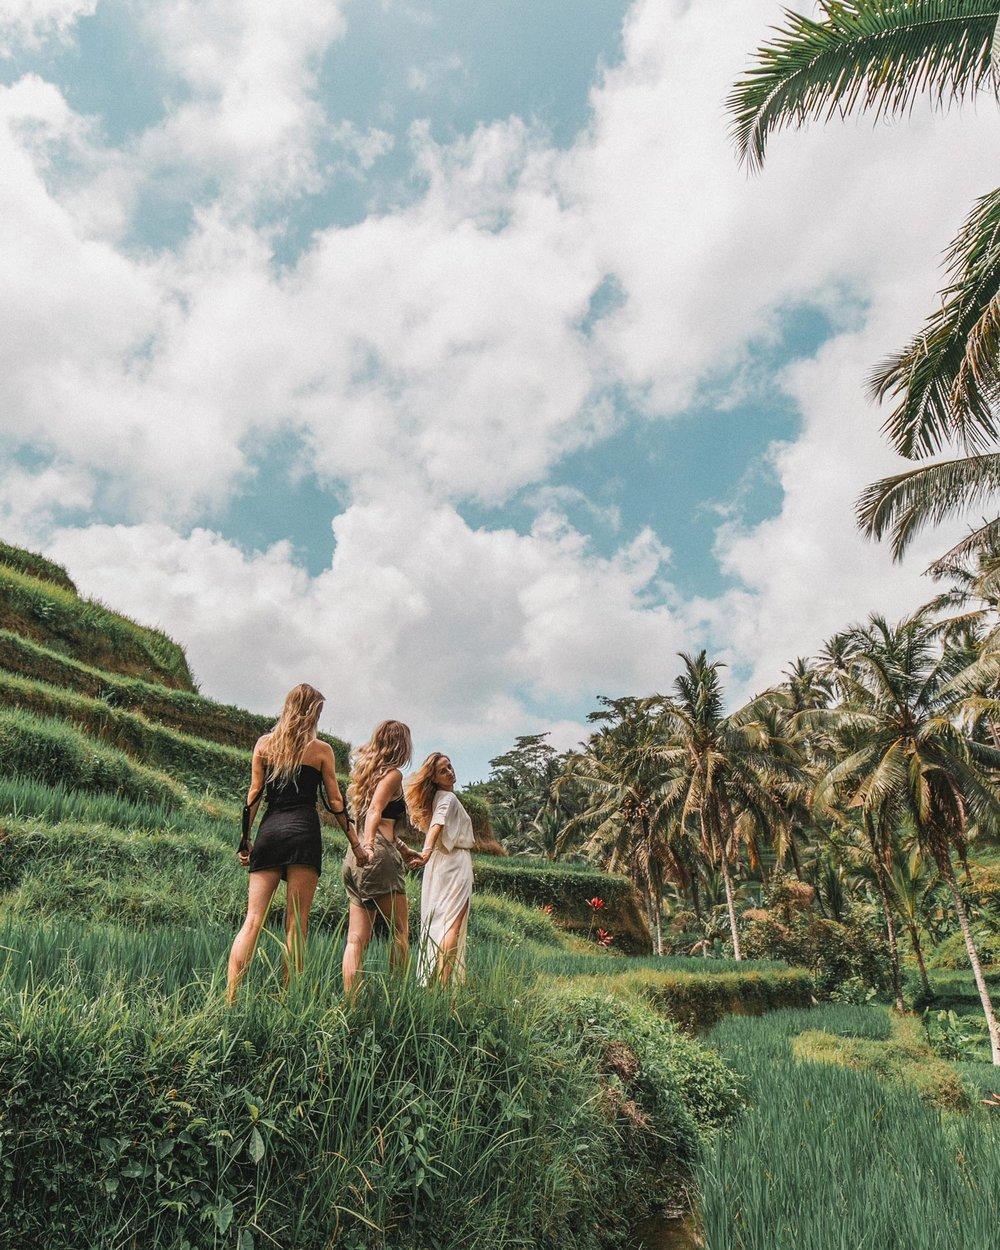 bali-indonesia-yoga-retreat-travel-photography-22.jpg